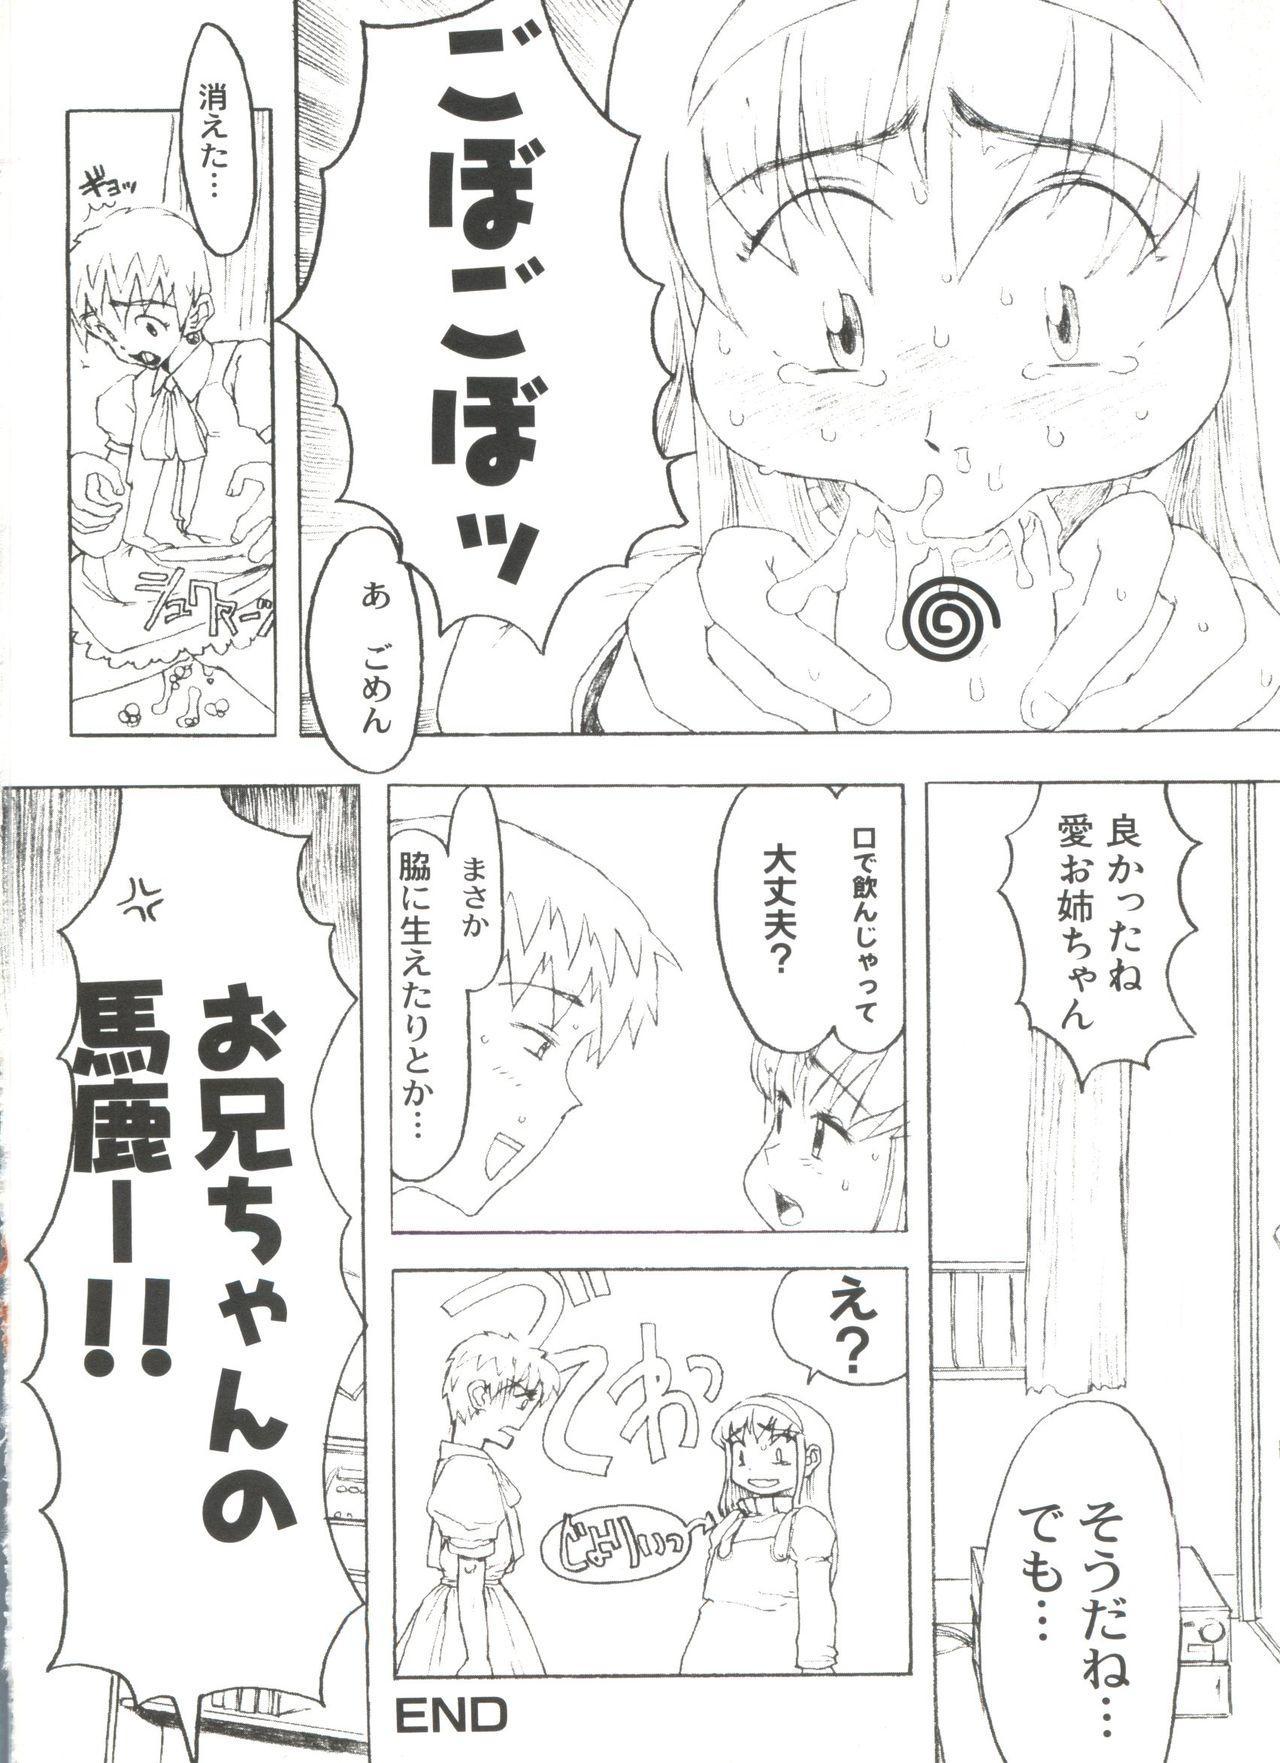 [Anthology] Denei Tamatebako 8 - Utakata no Tenshi-tachi II (Various) 83